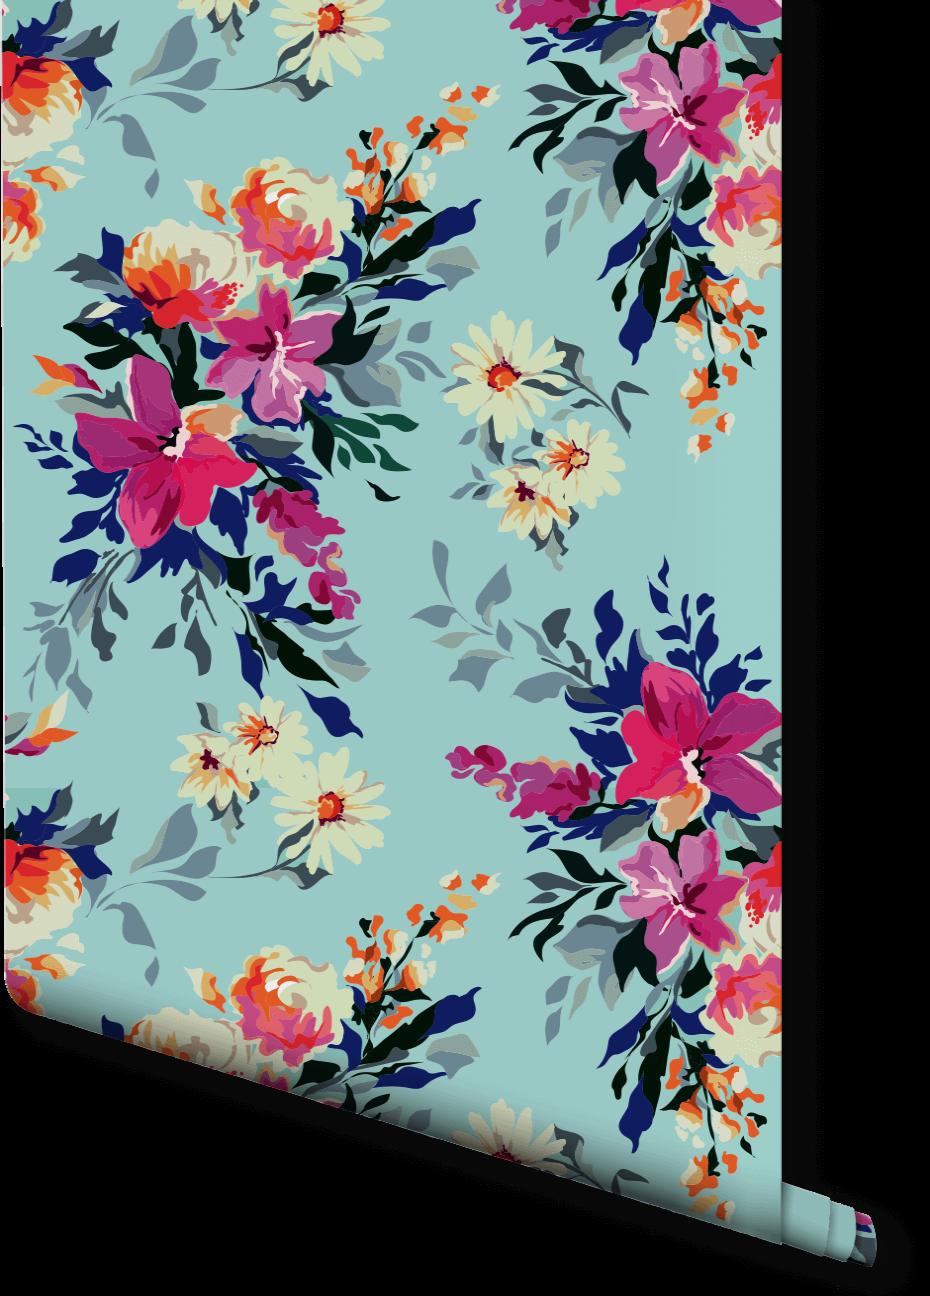 Cheap Home Decor Decoracion Saleprice 28 Floral Wallpaper